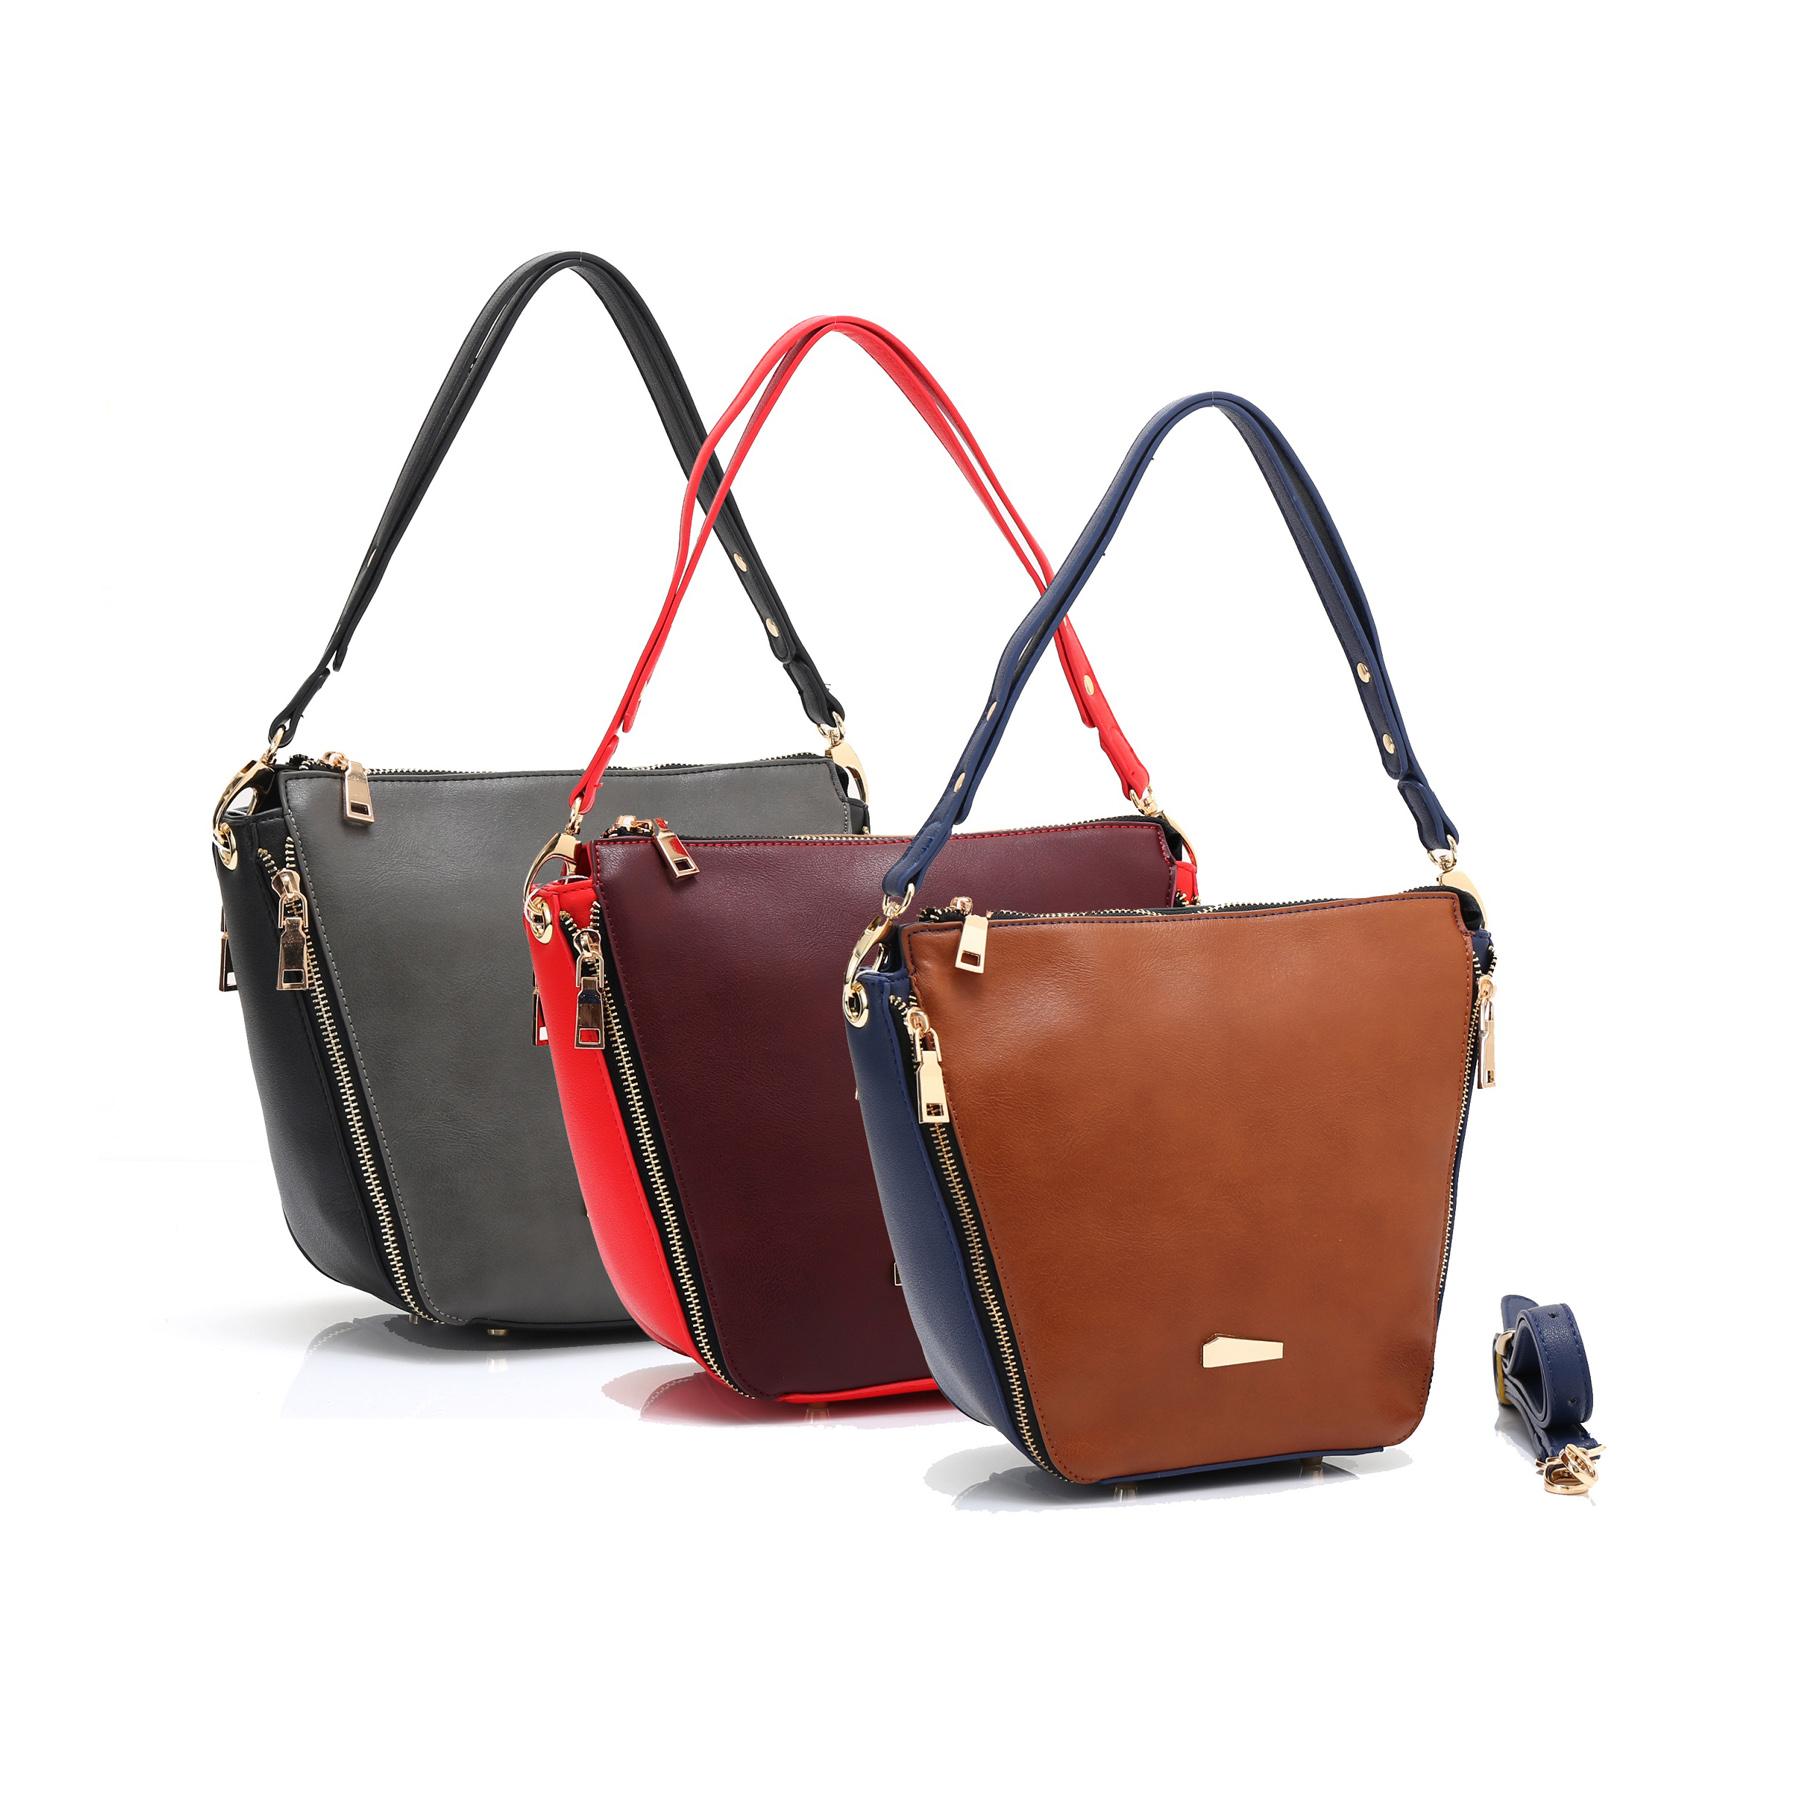 bda54b7391 HB-8697-silk-caress-designer-handbag-trapezium-triangular-